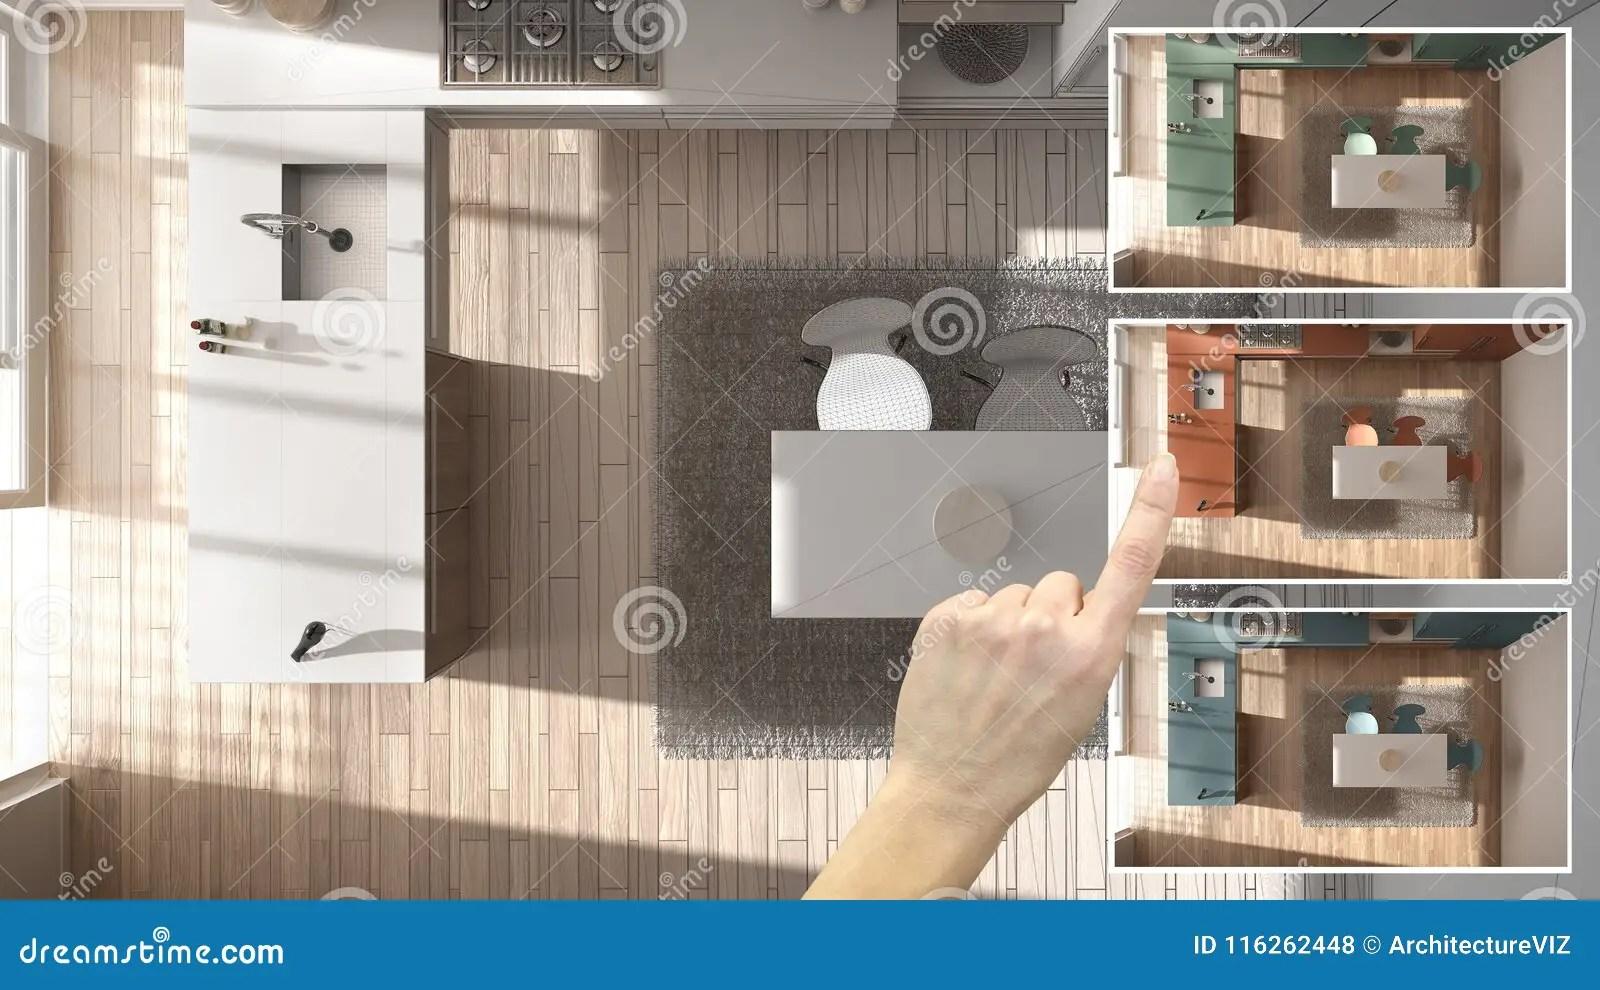 Online Kitchen Planner Tool Uk